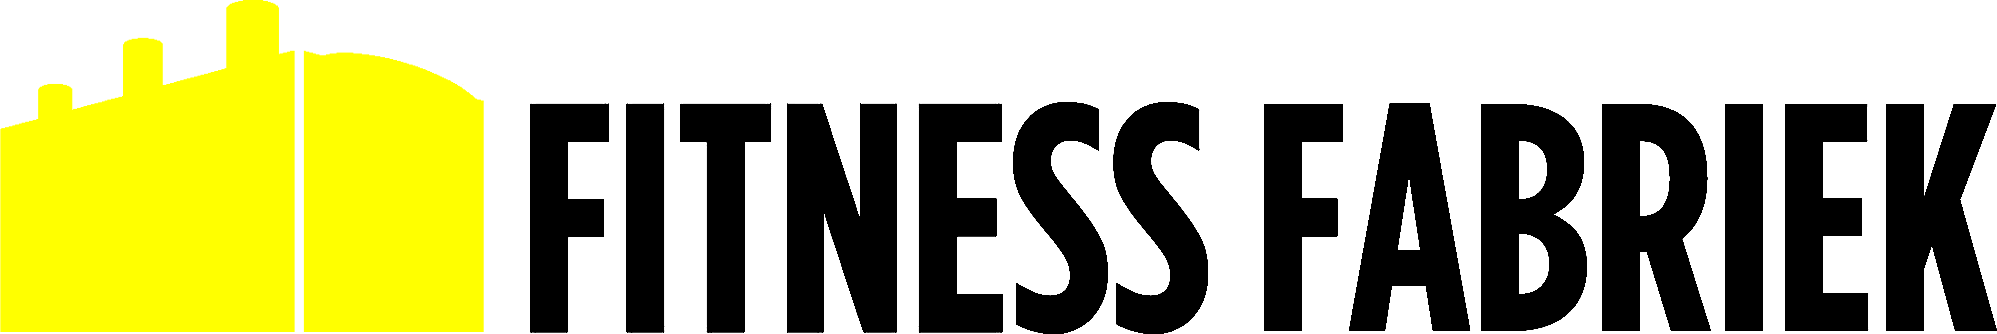 Fitness Fabriek logo